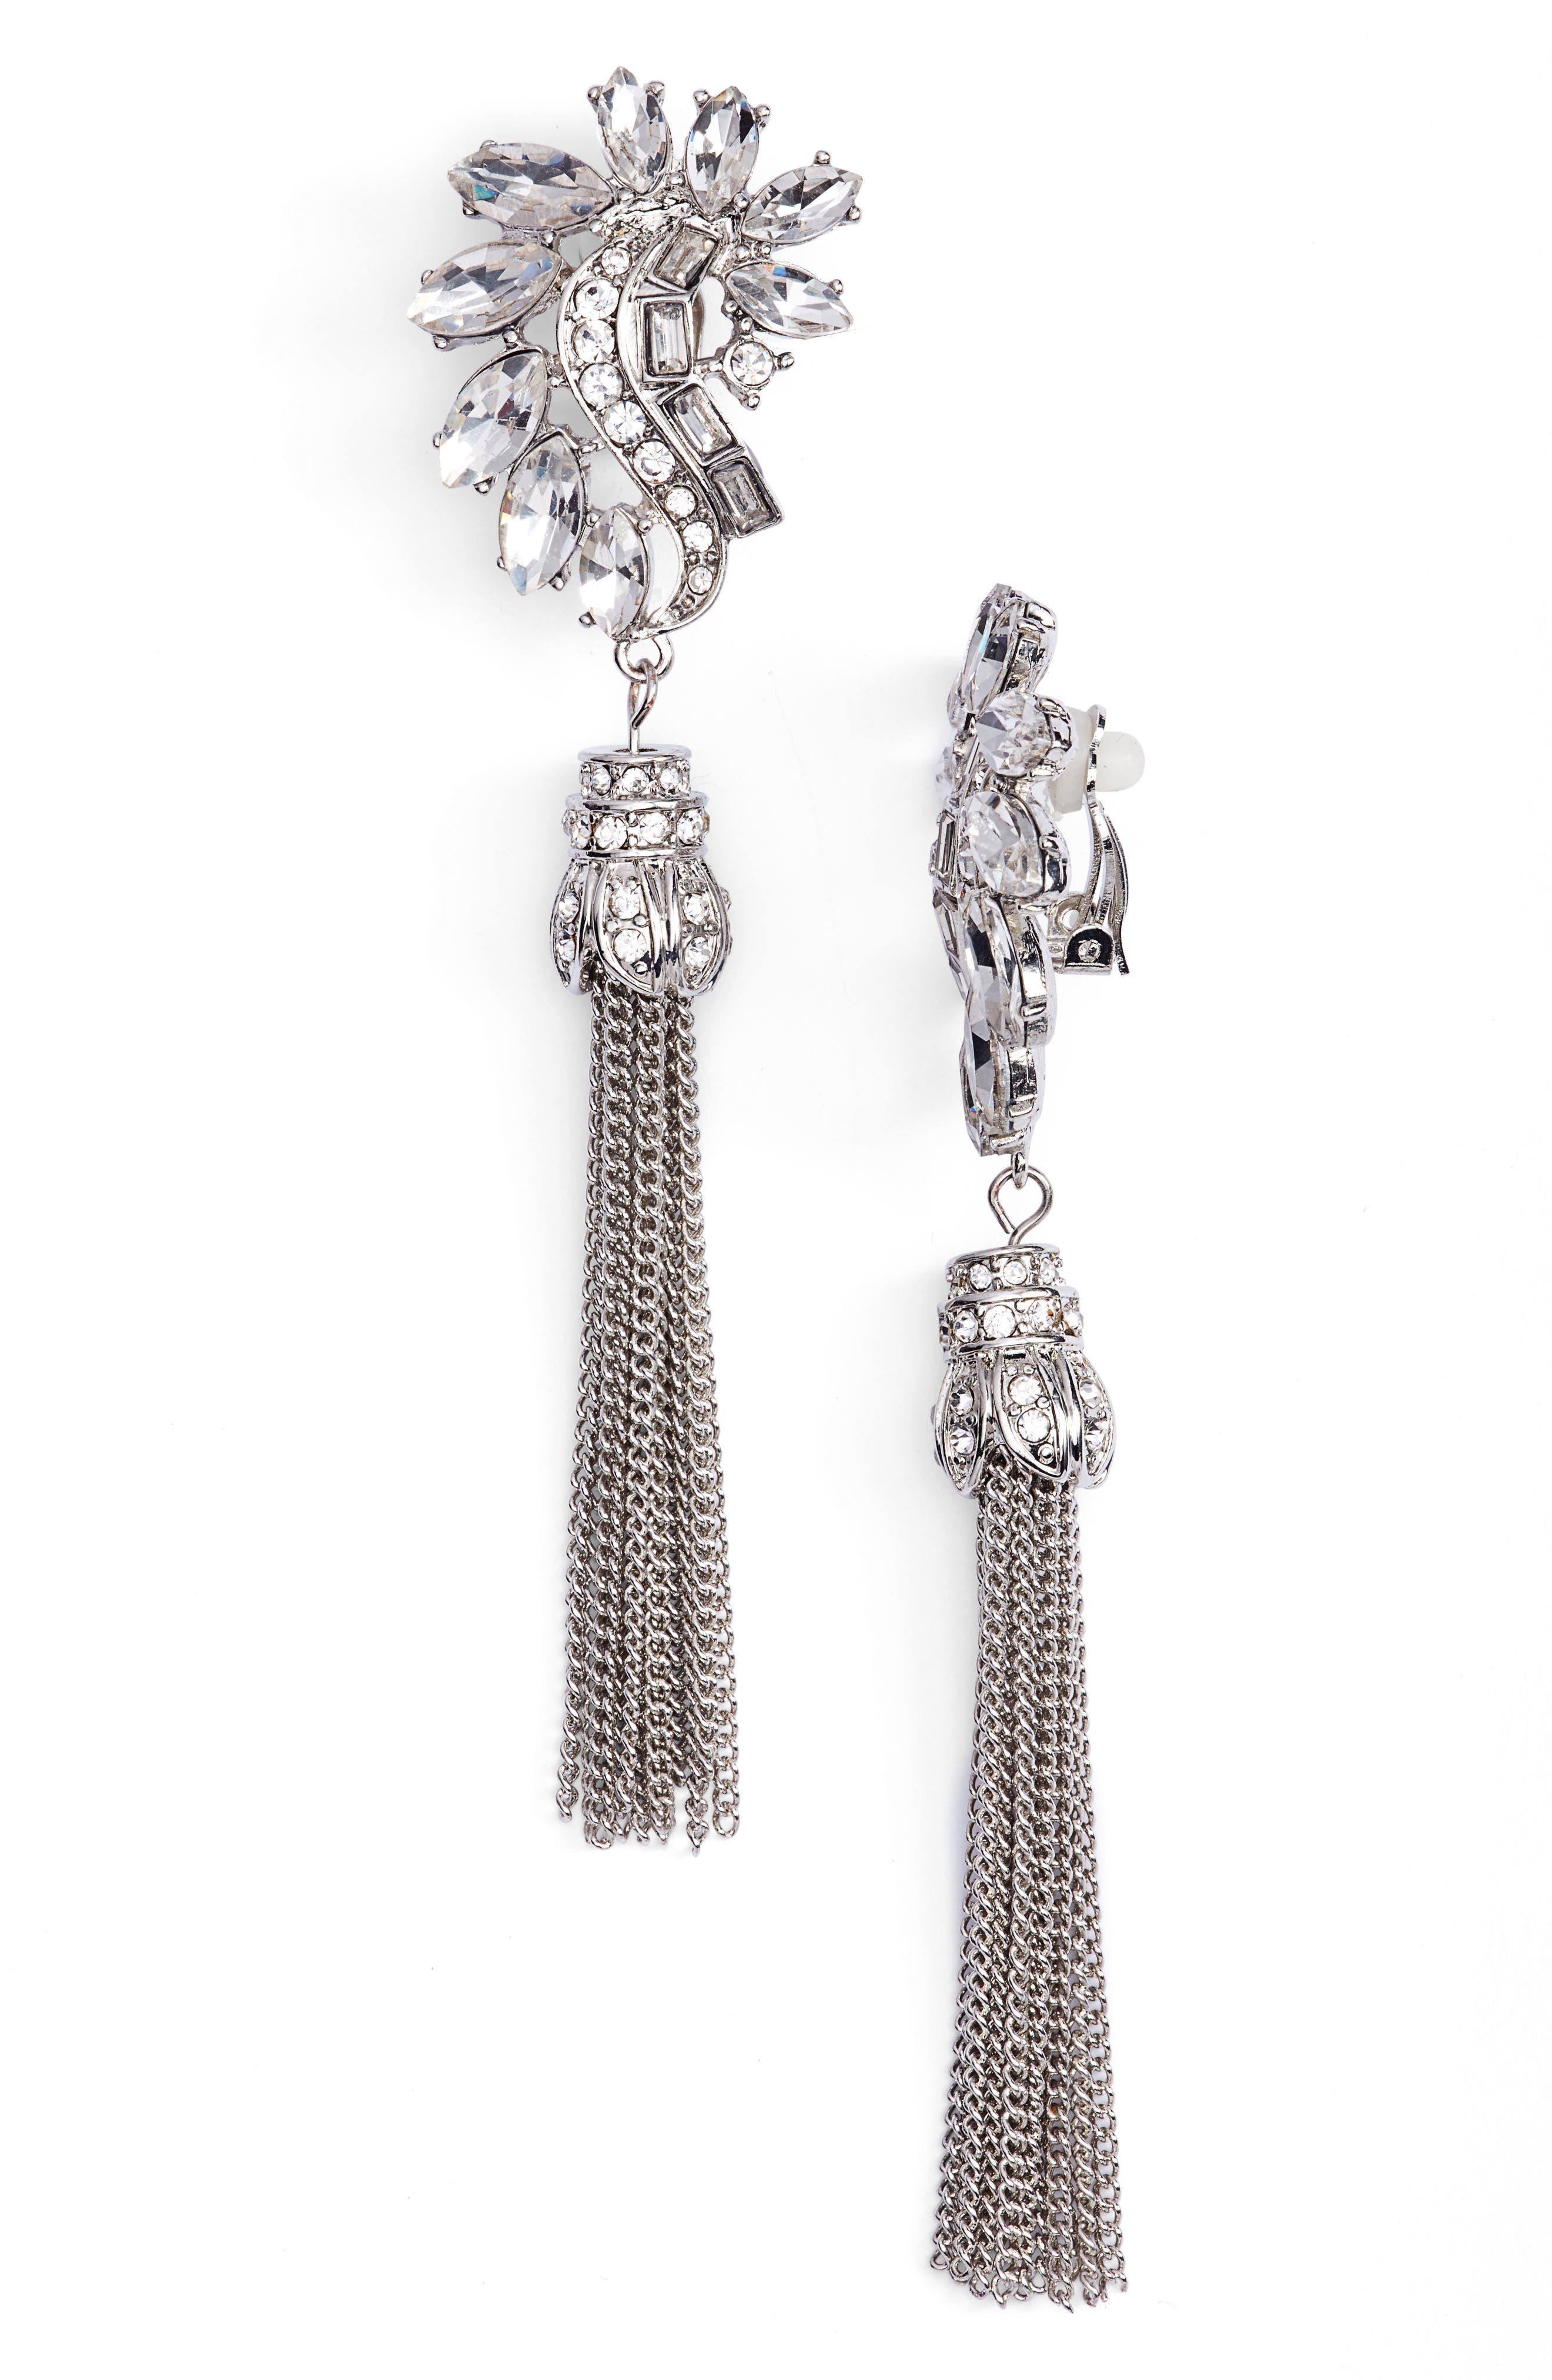 Crystal & Chain Tassel Earrings,                             Main thumbnail 1, color,                             100